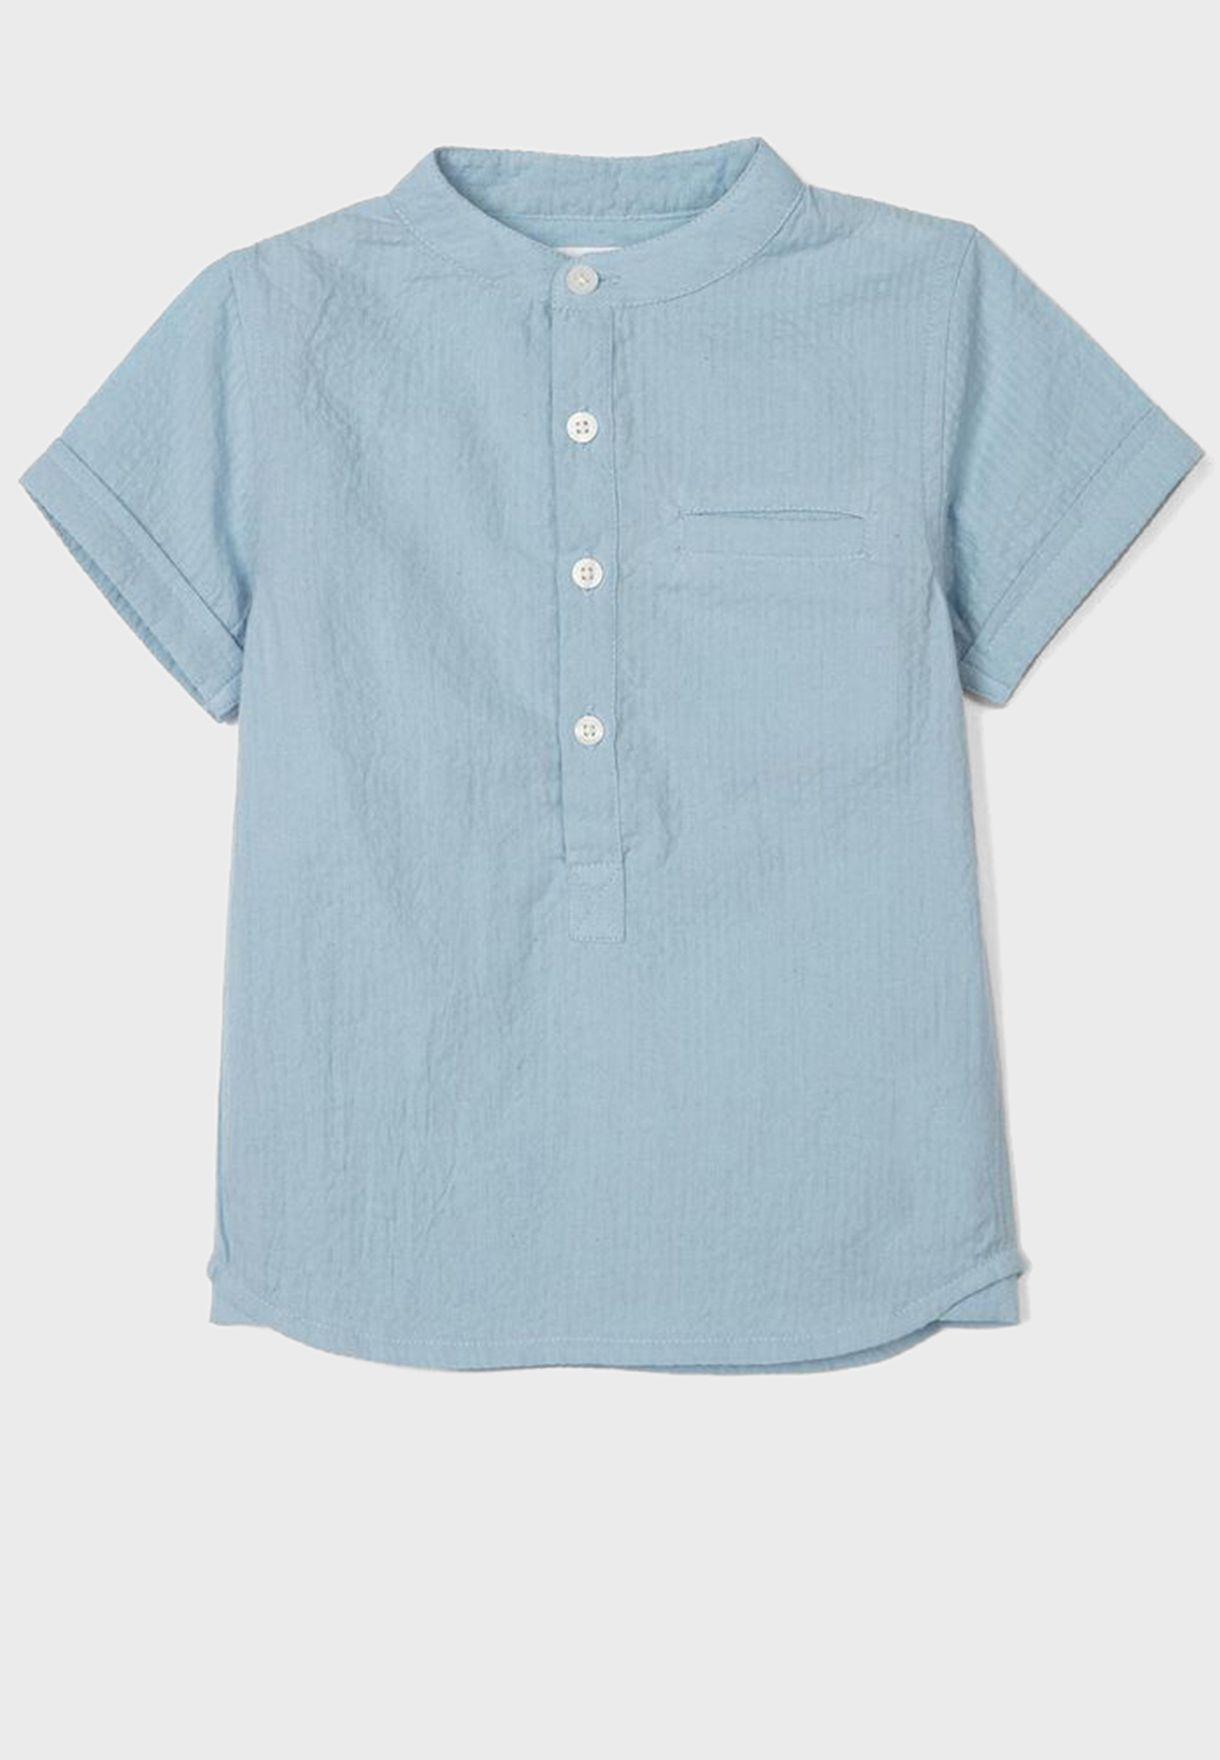 Infant Half Placket Shirt